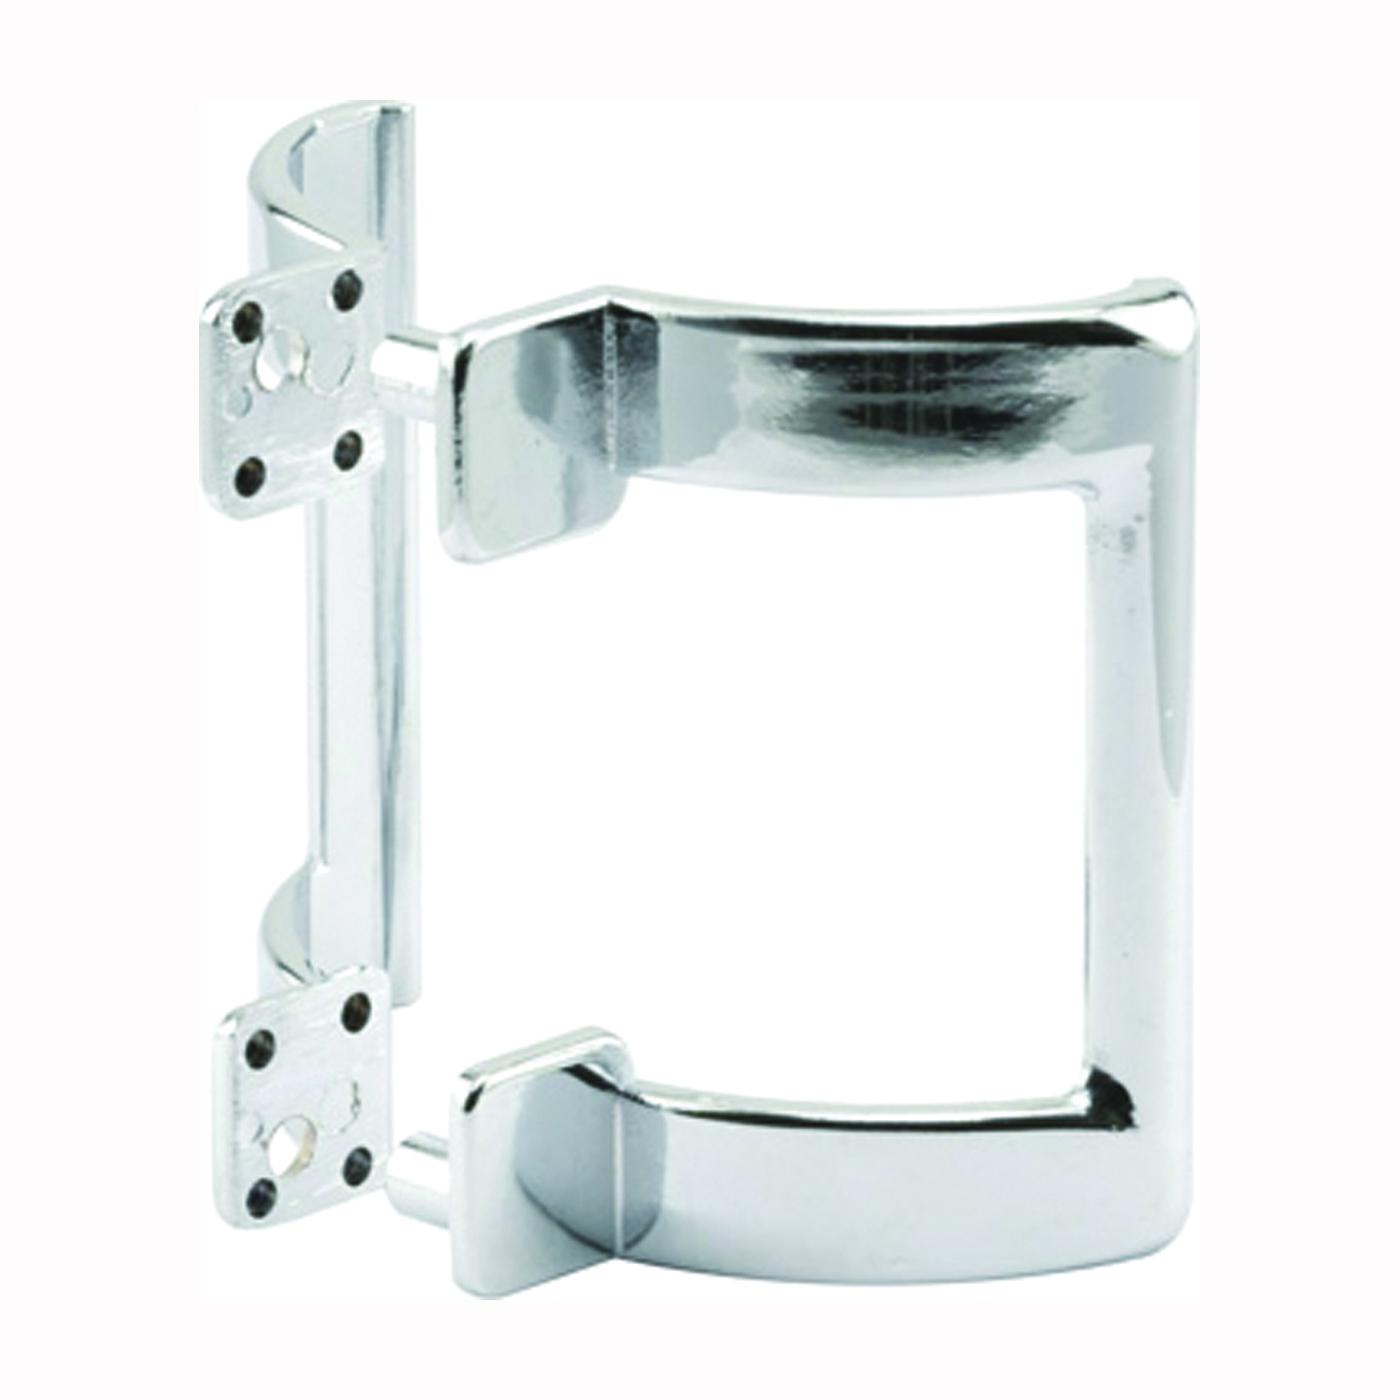 Picture of Prime-Line M 6160 Shower Door Handle Set, 2-1/4 in L Handle, Chrome